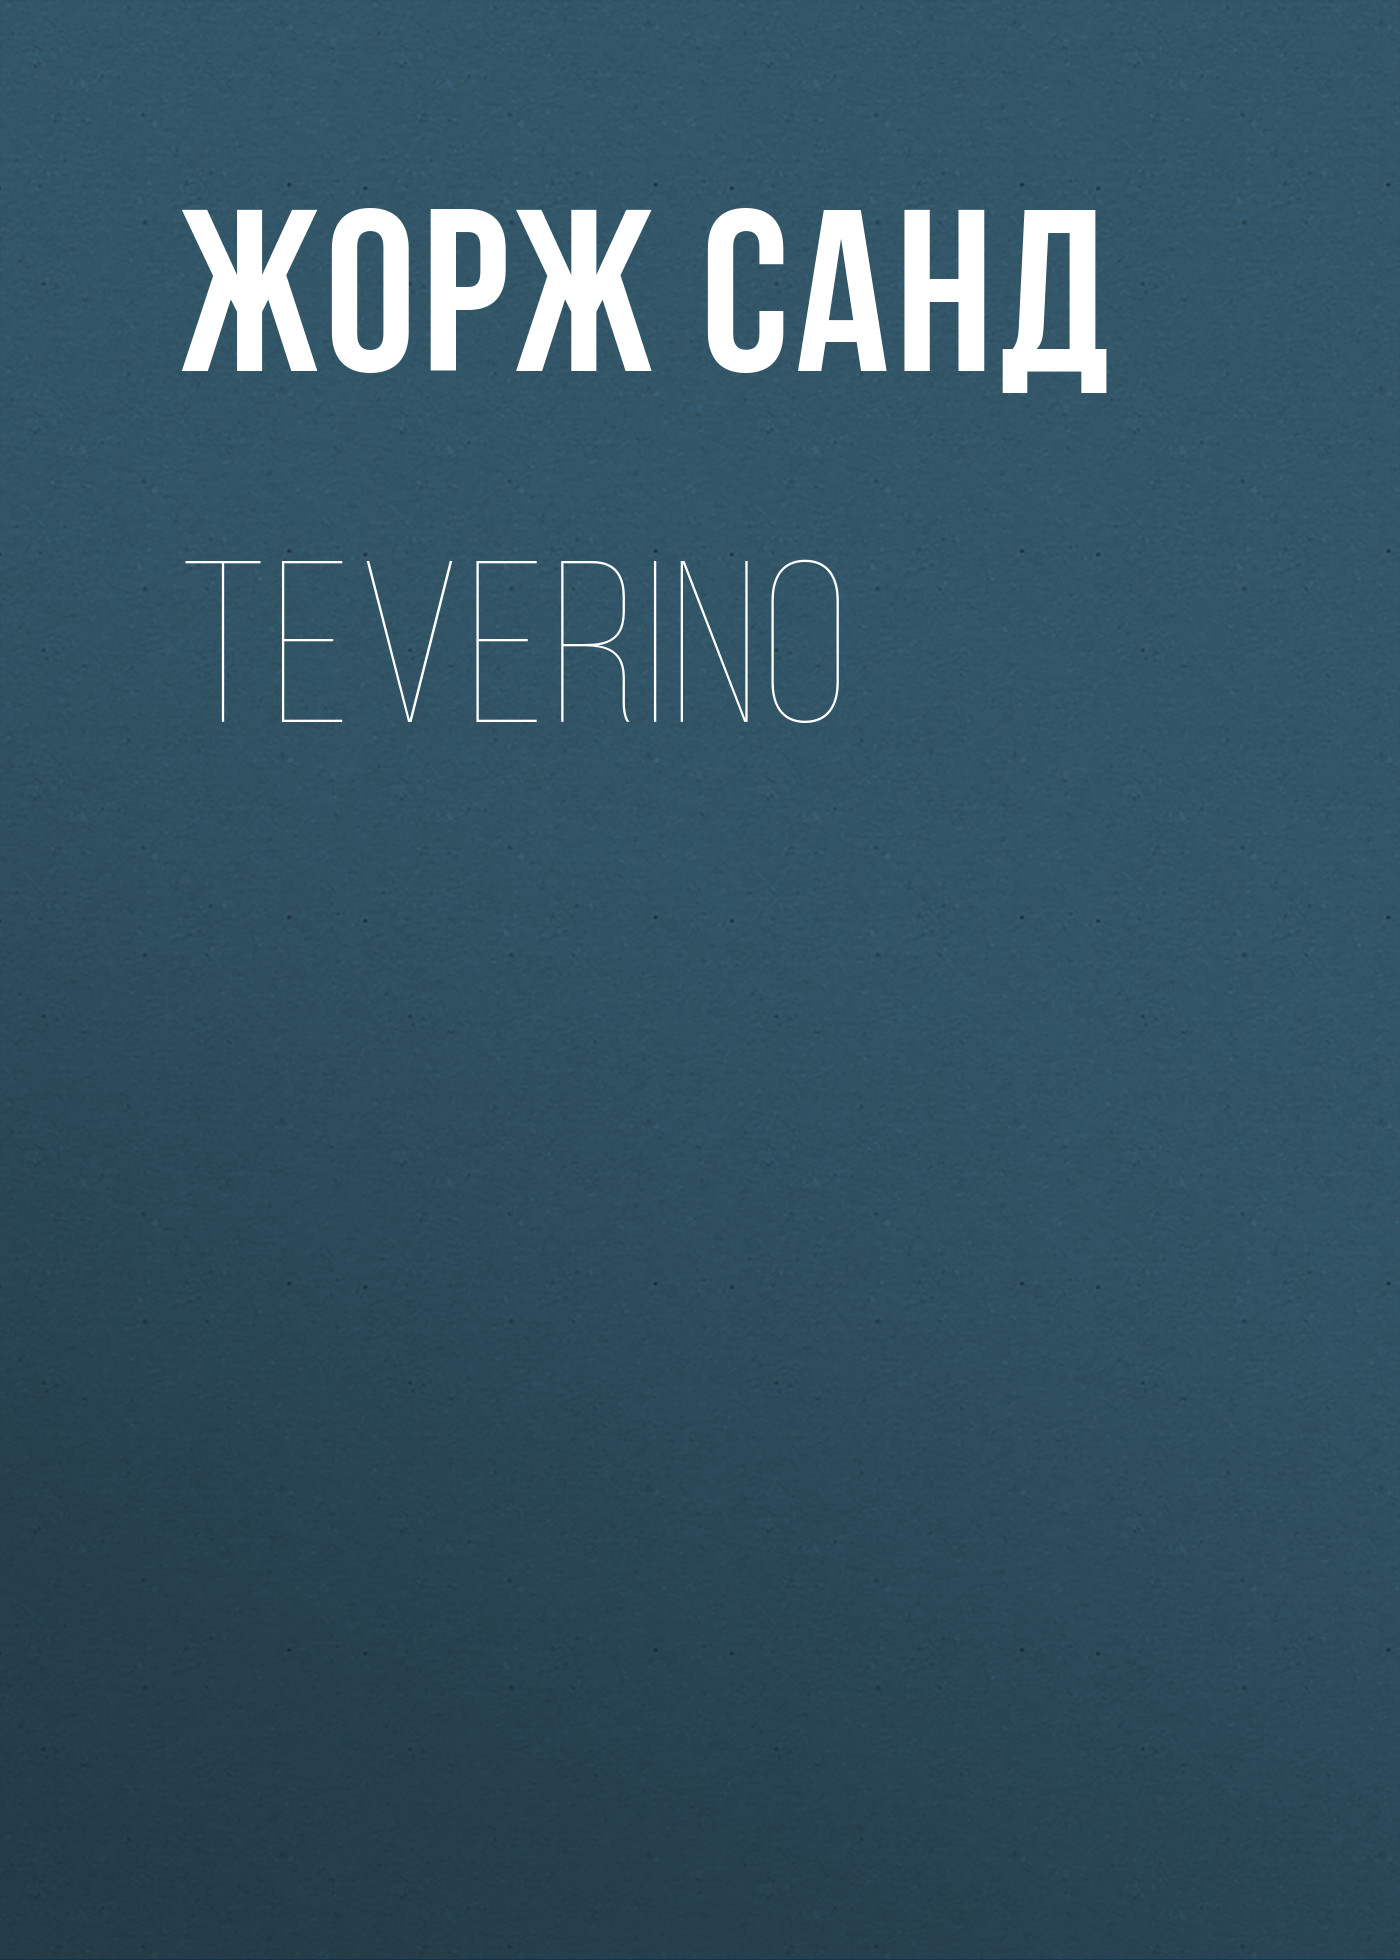 Teverino